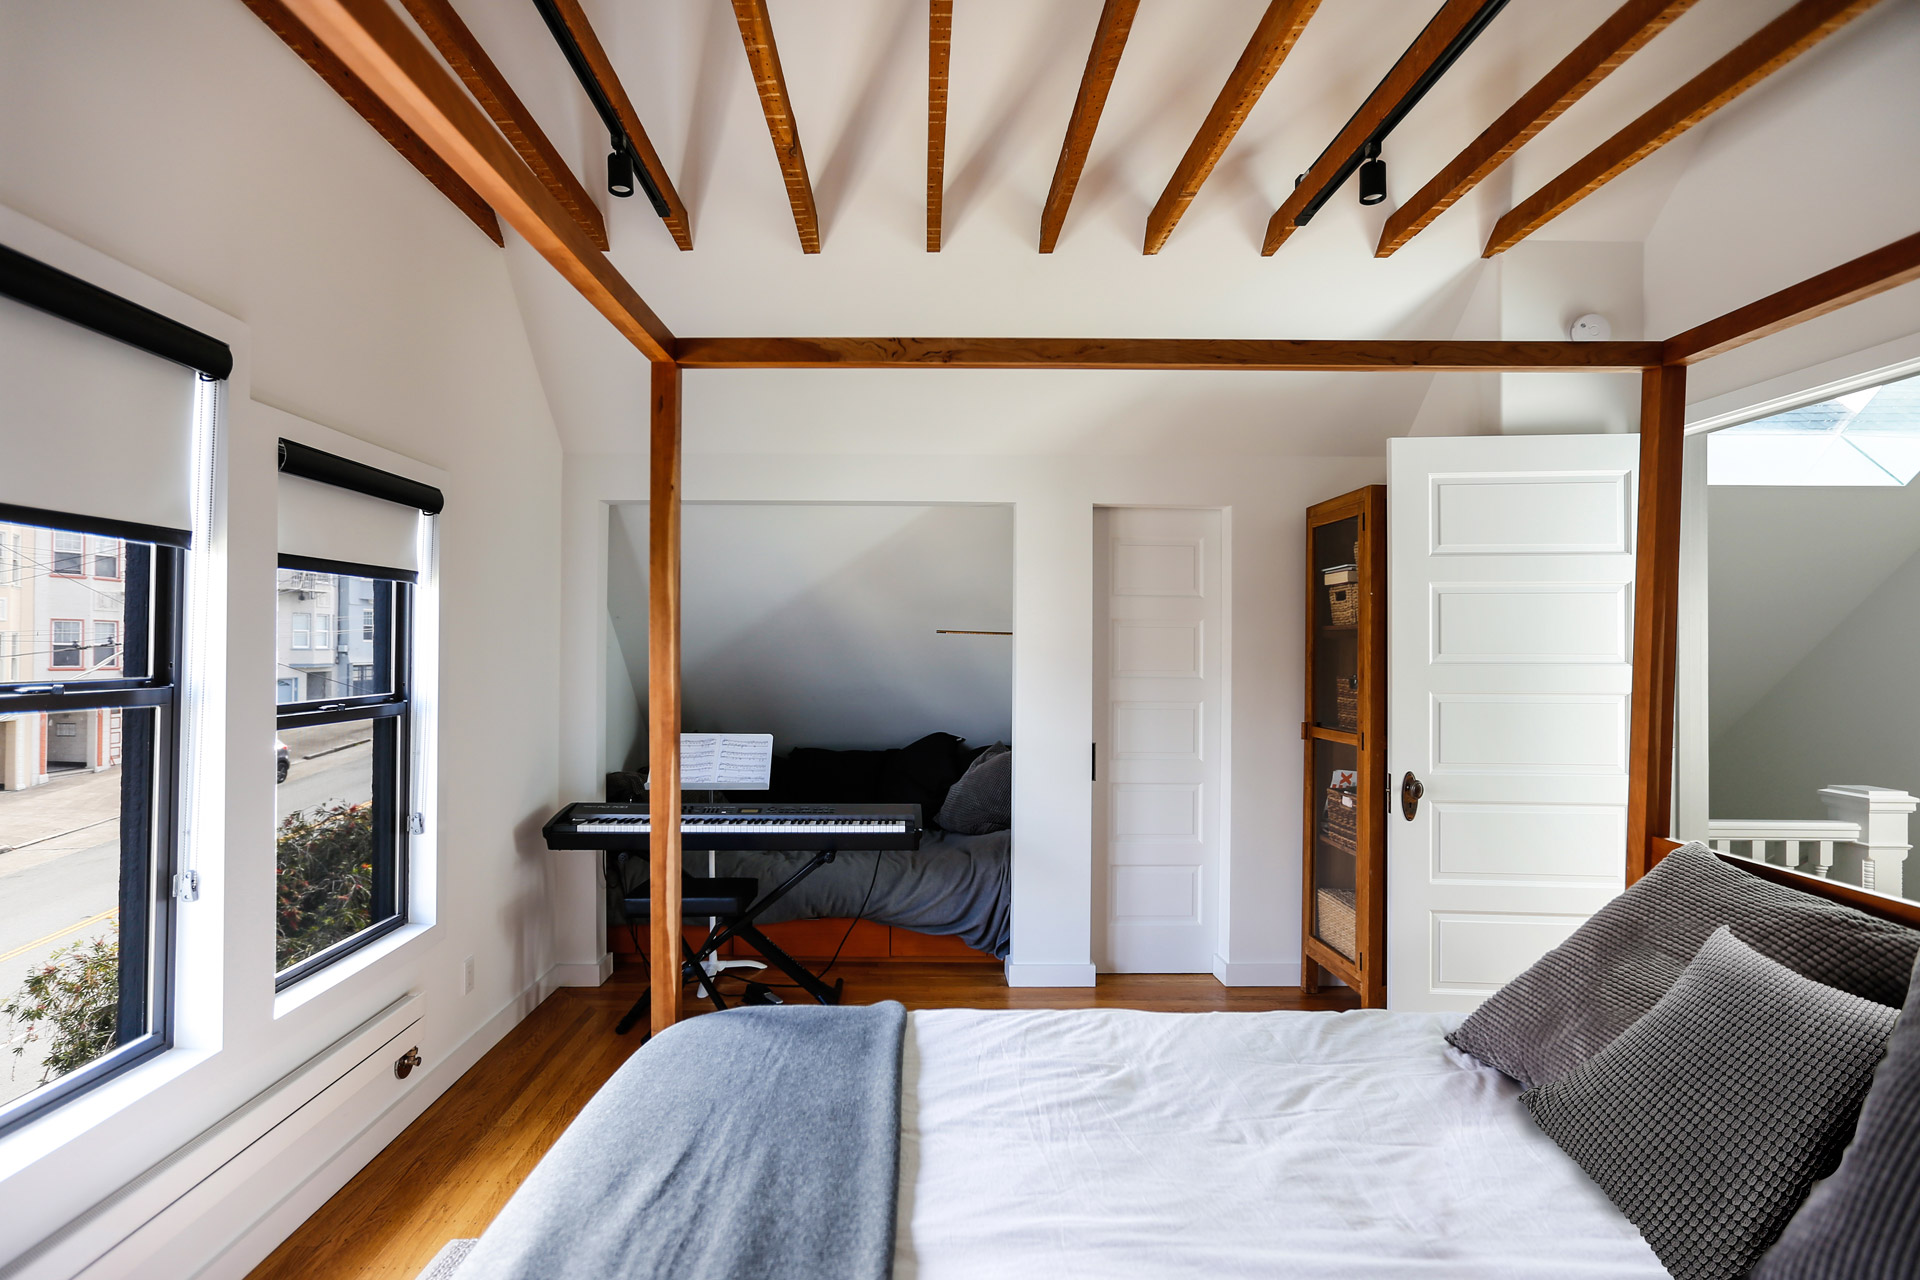 Balboa Residence decor